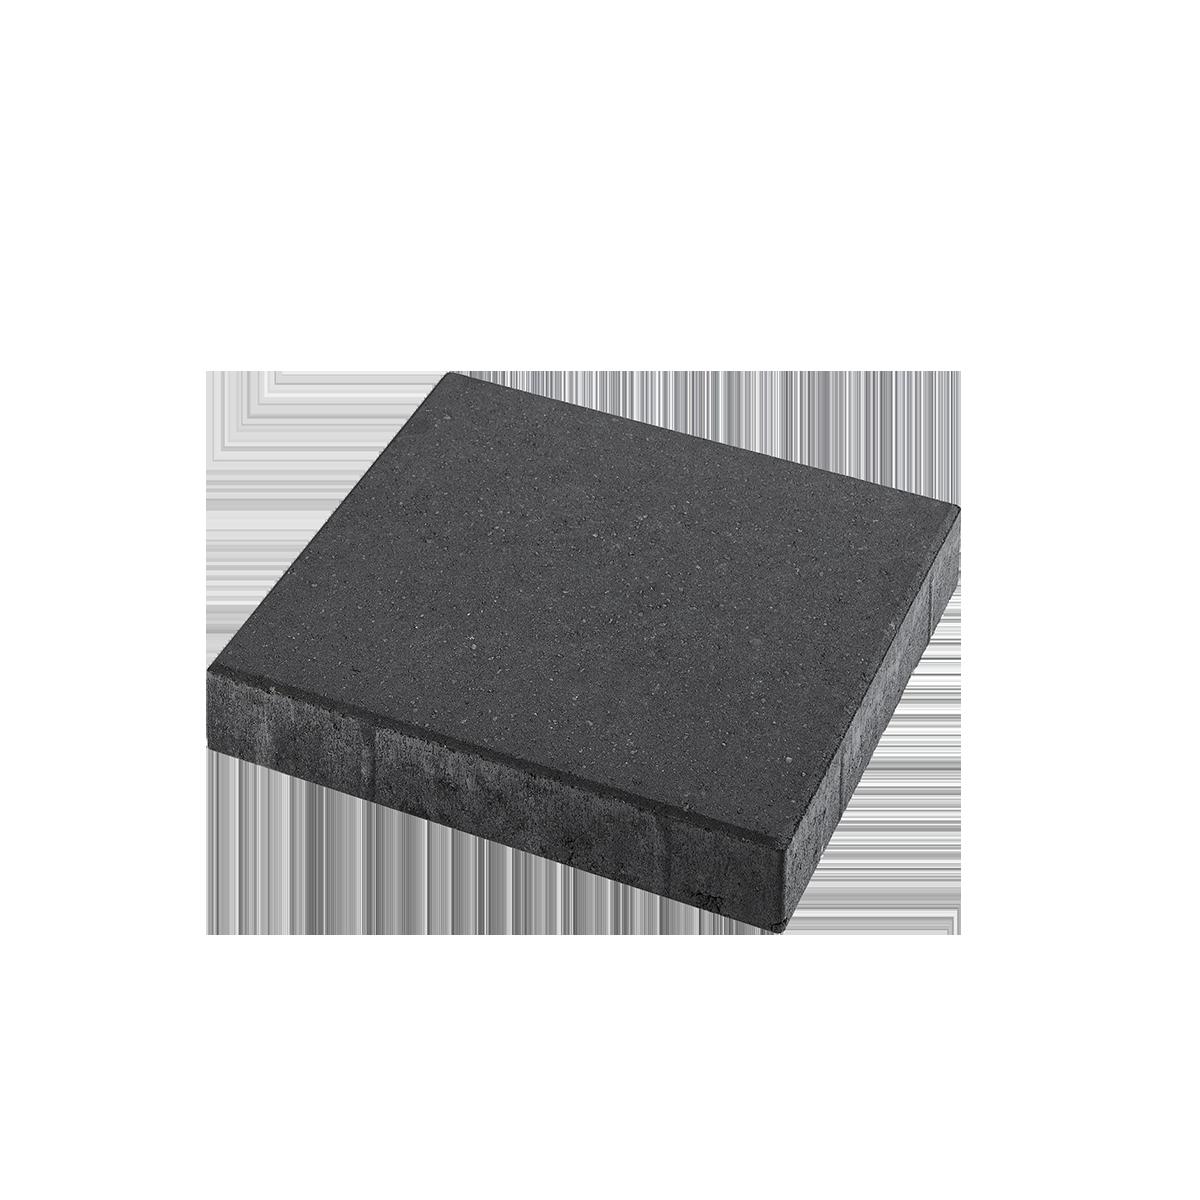 Fliser 40x40x6 cm Sort/Antracit